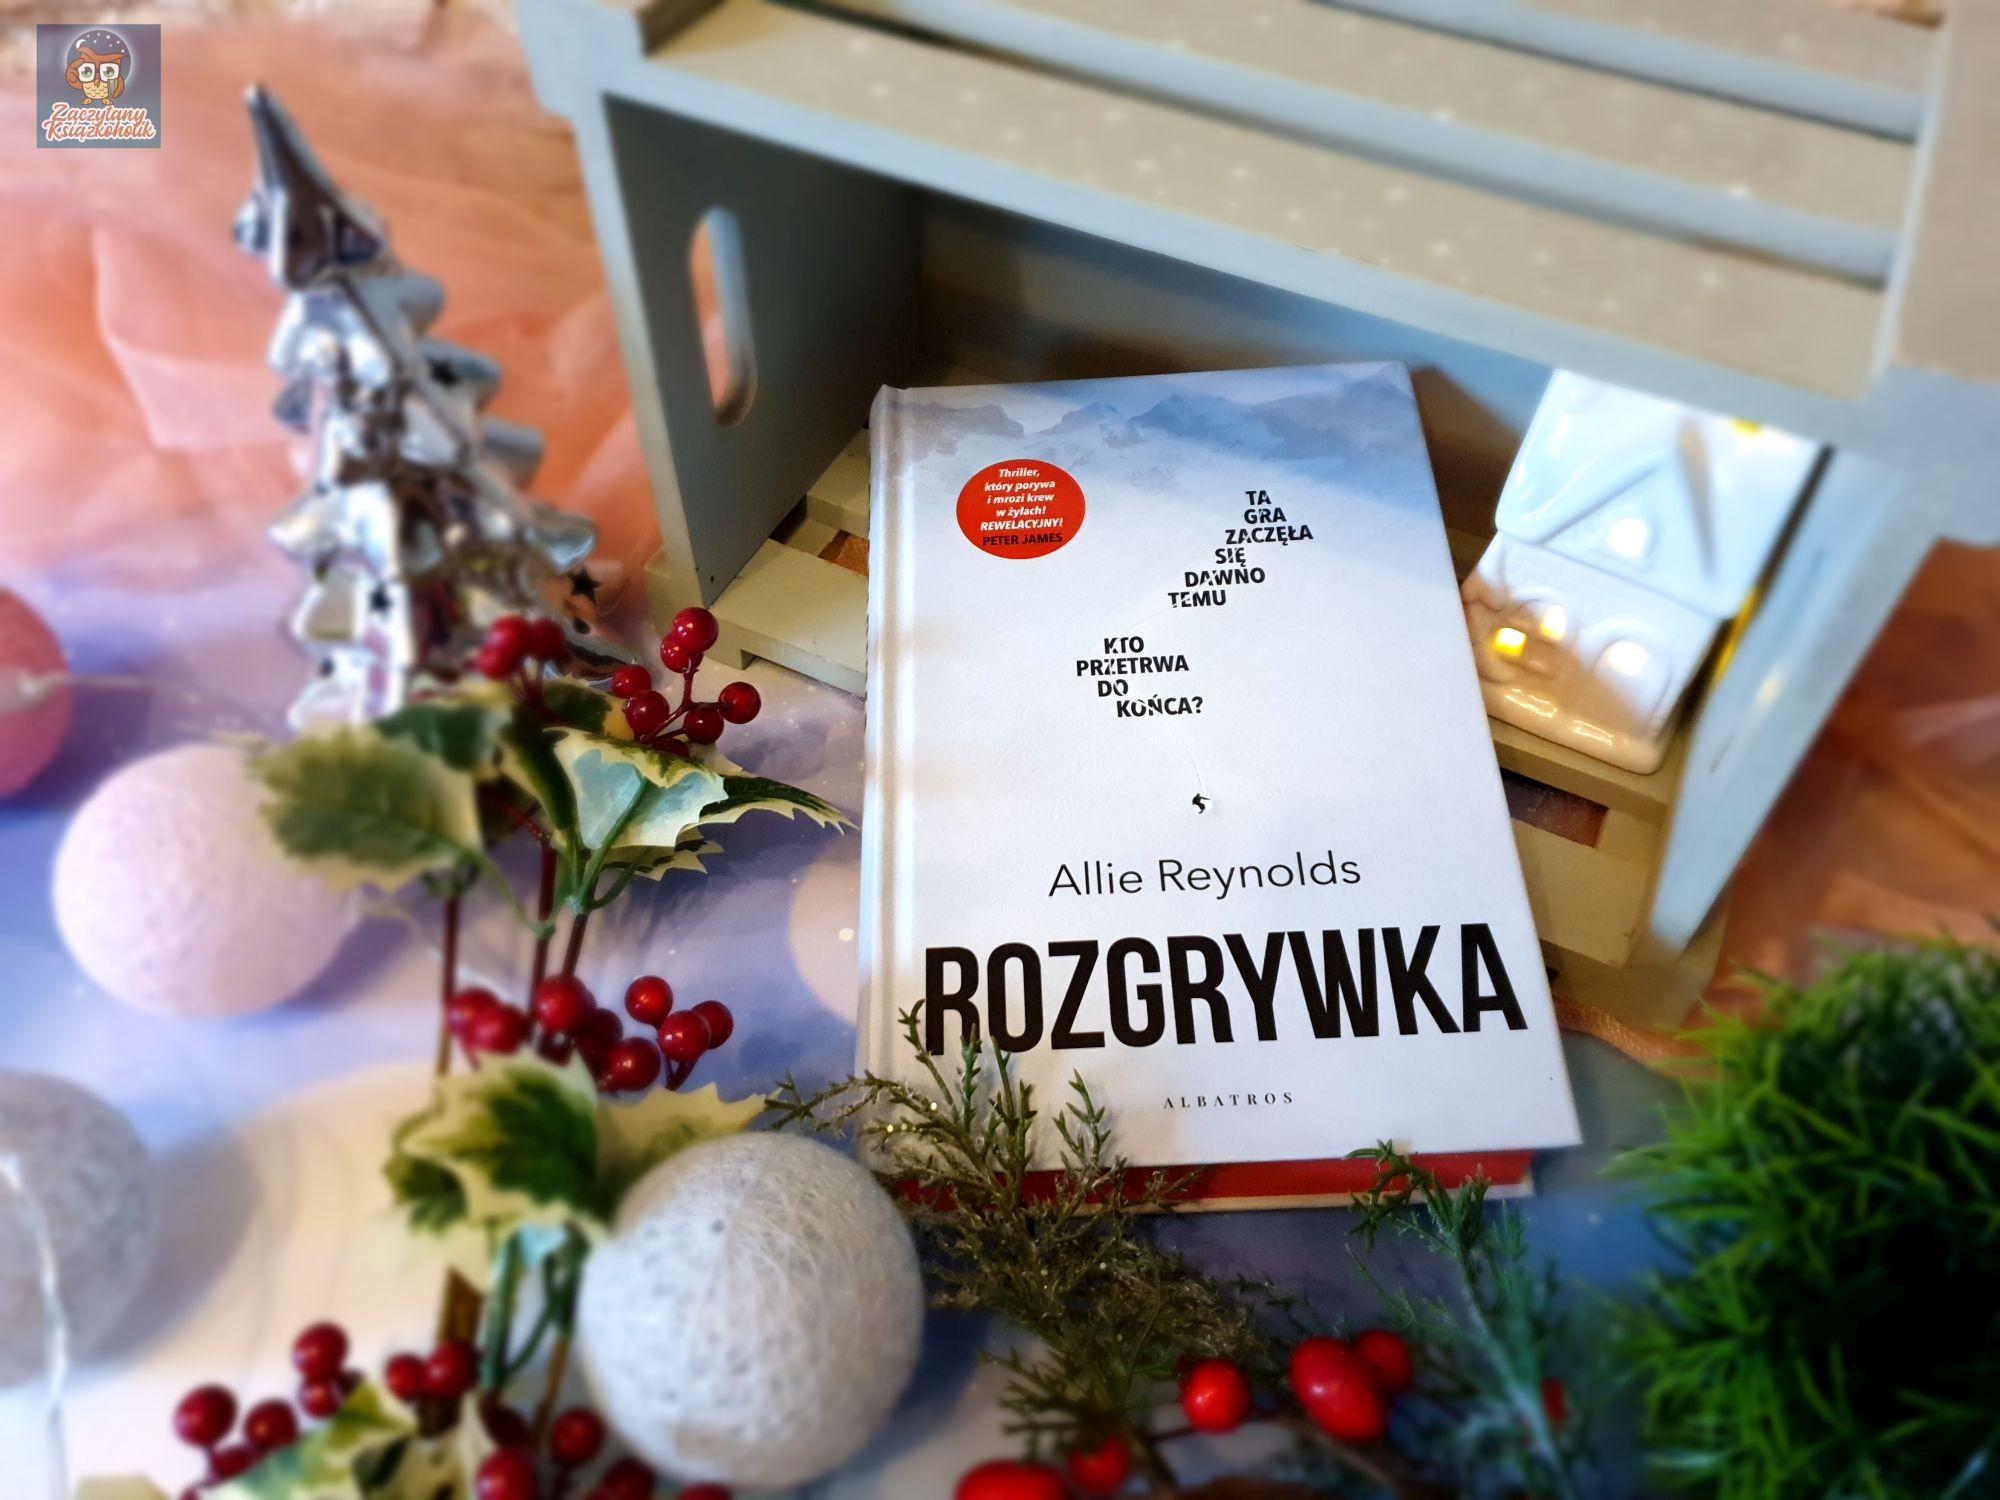 Rozgrywka, Allie Reynolds, zaczytanyksiazkoholik.pl